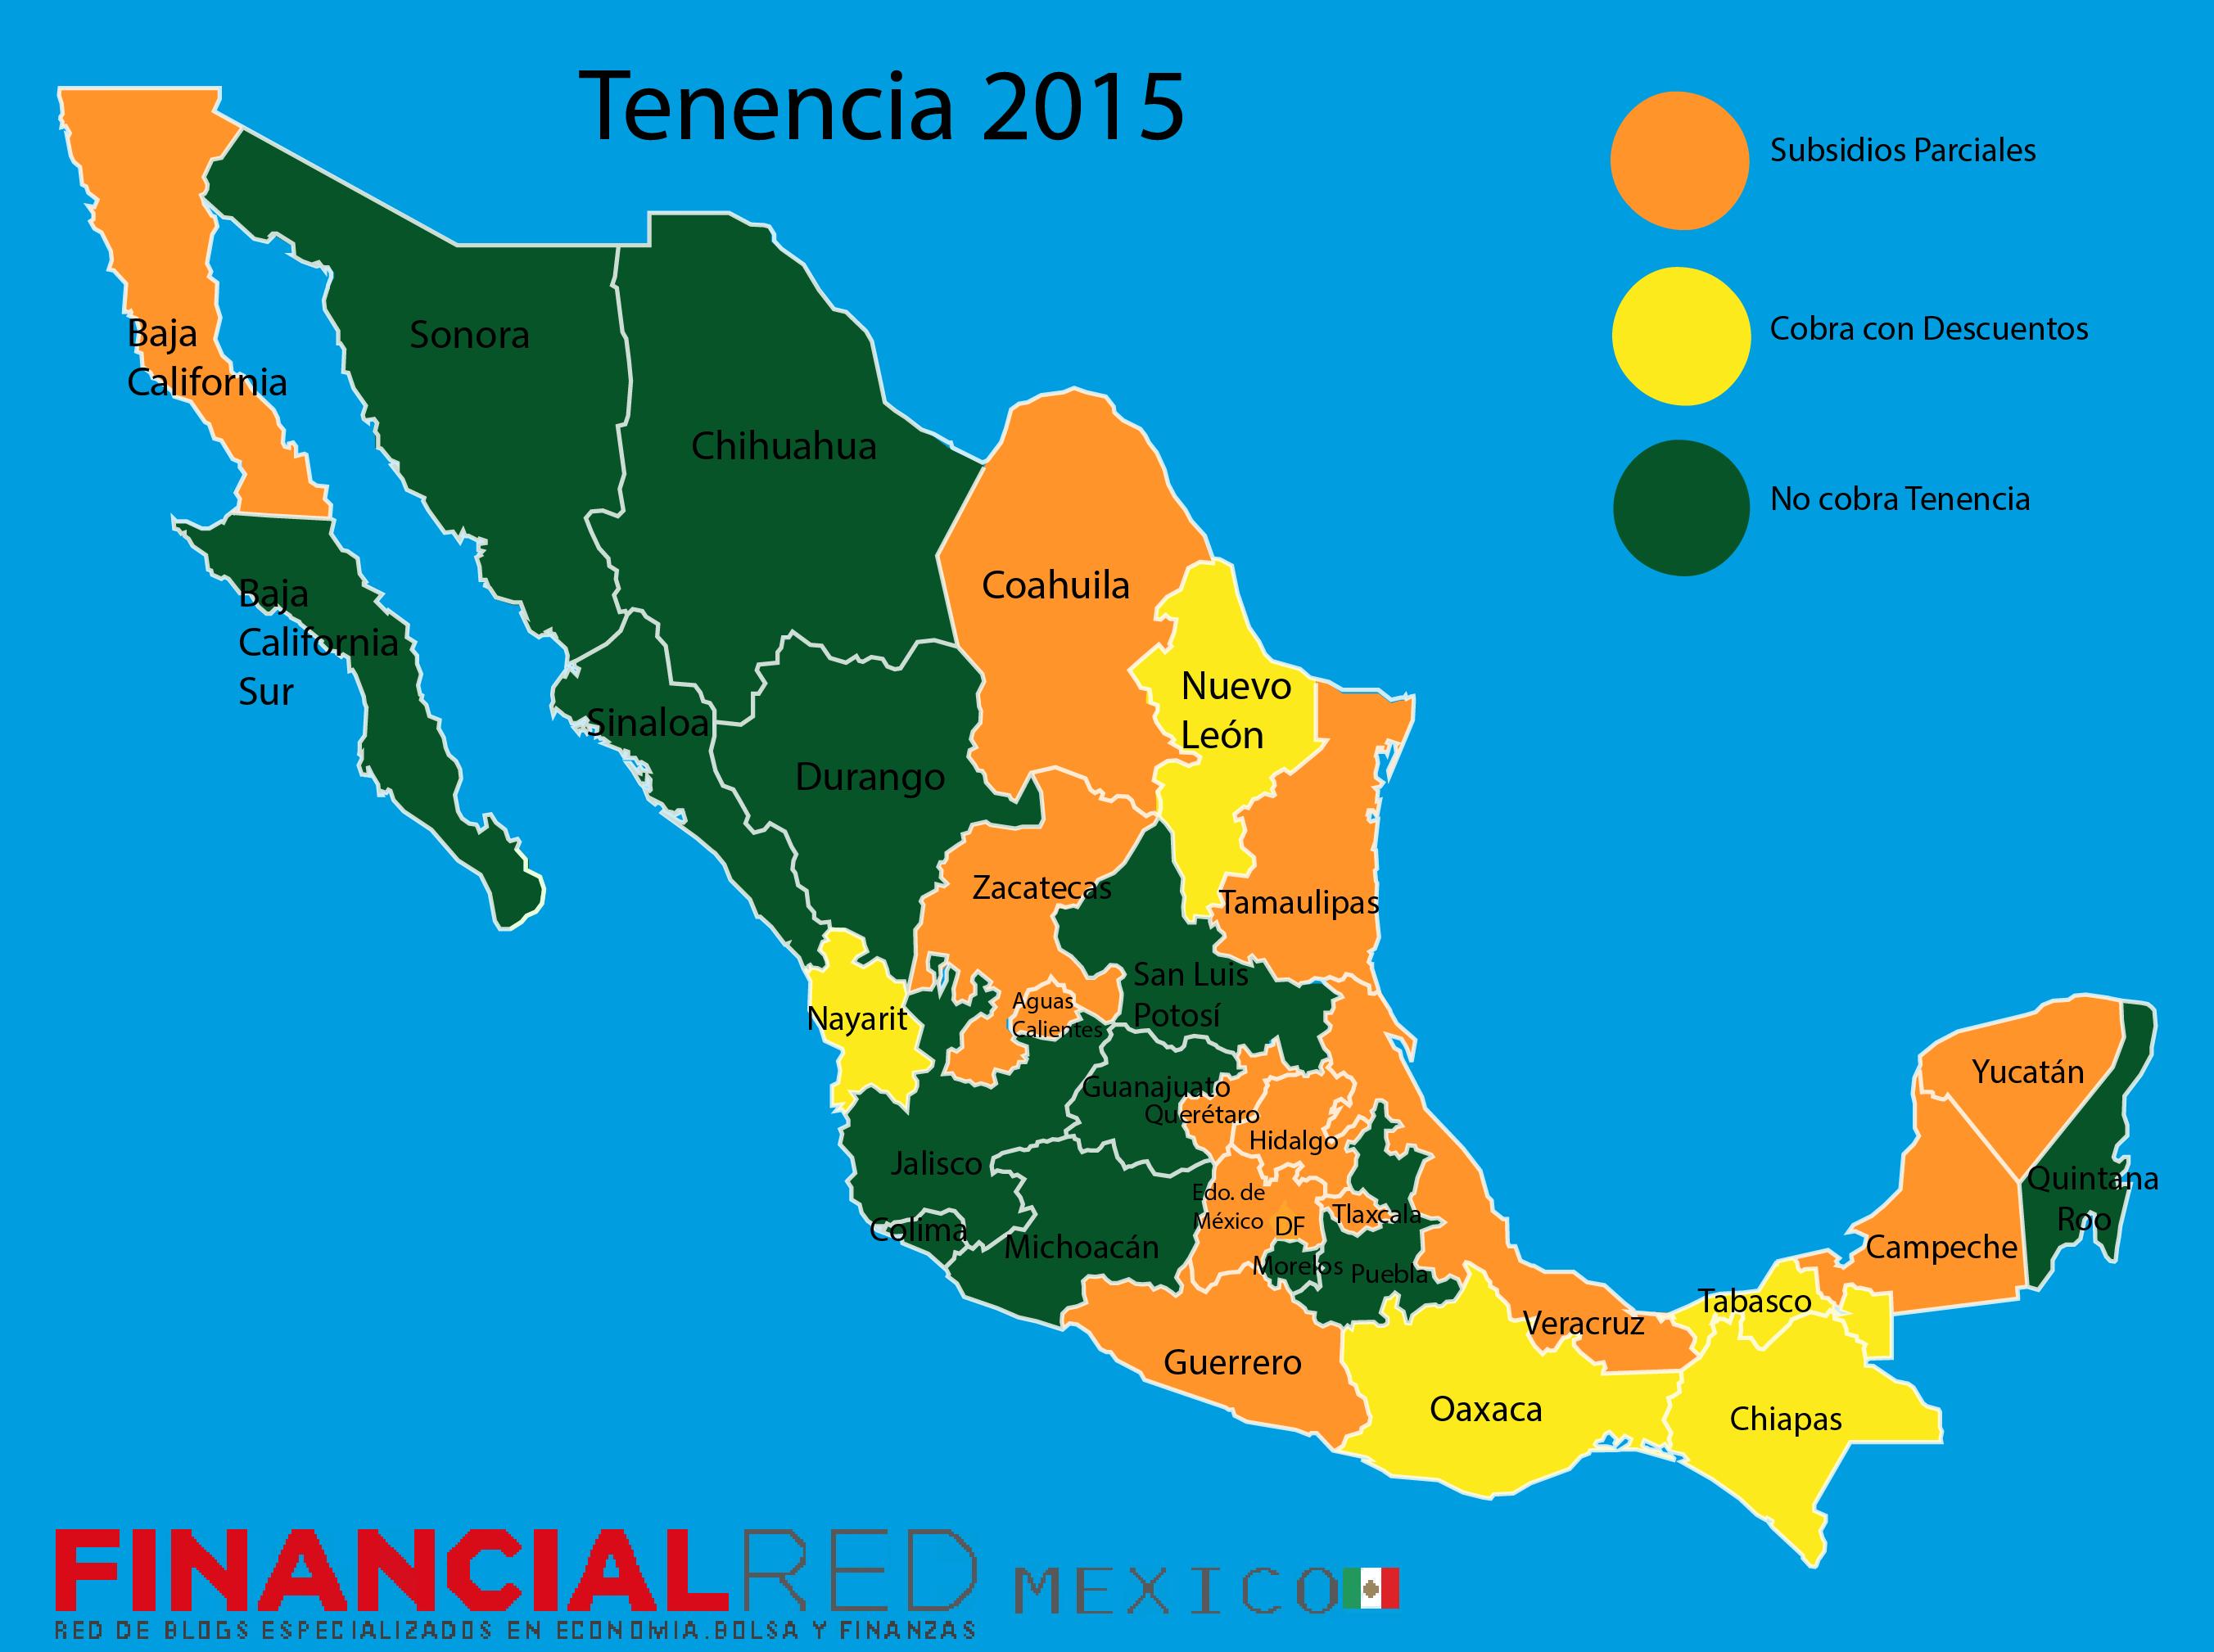 Tenencia Estado De Mexico 2015